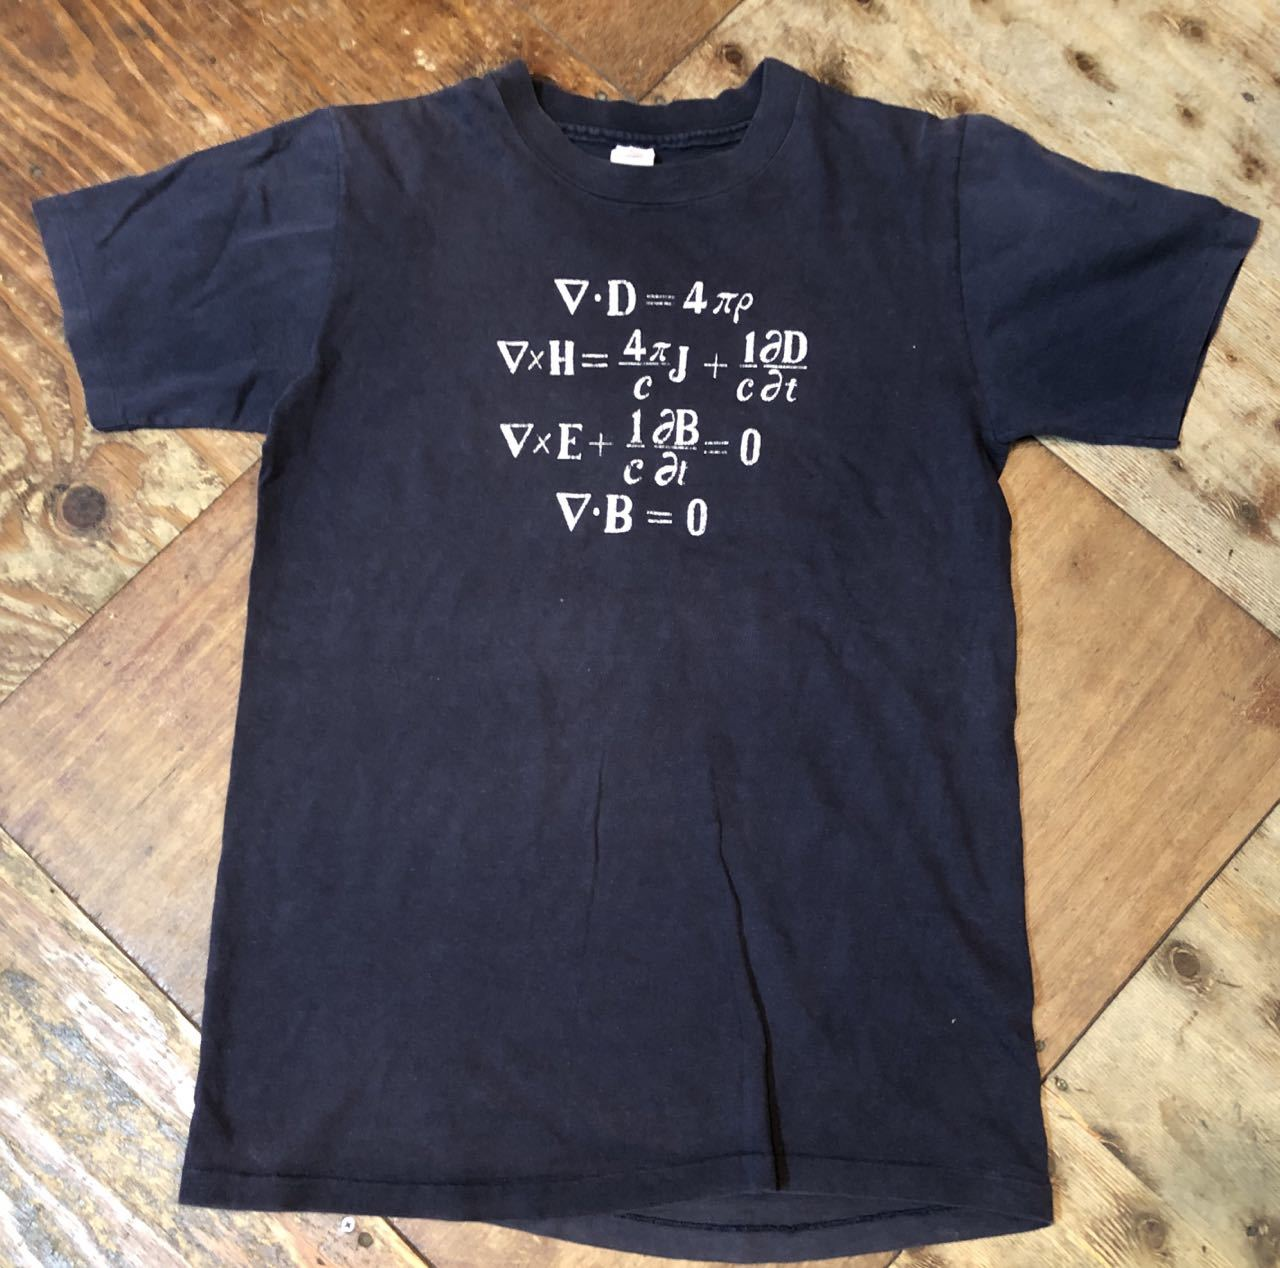 80s all cotton チャンピオン トリコタグ 数式プリント Tシャツ! _c0144020_19322550.jpg